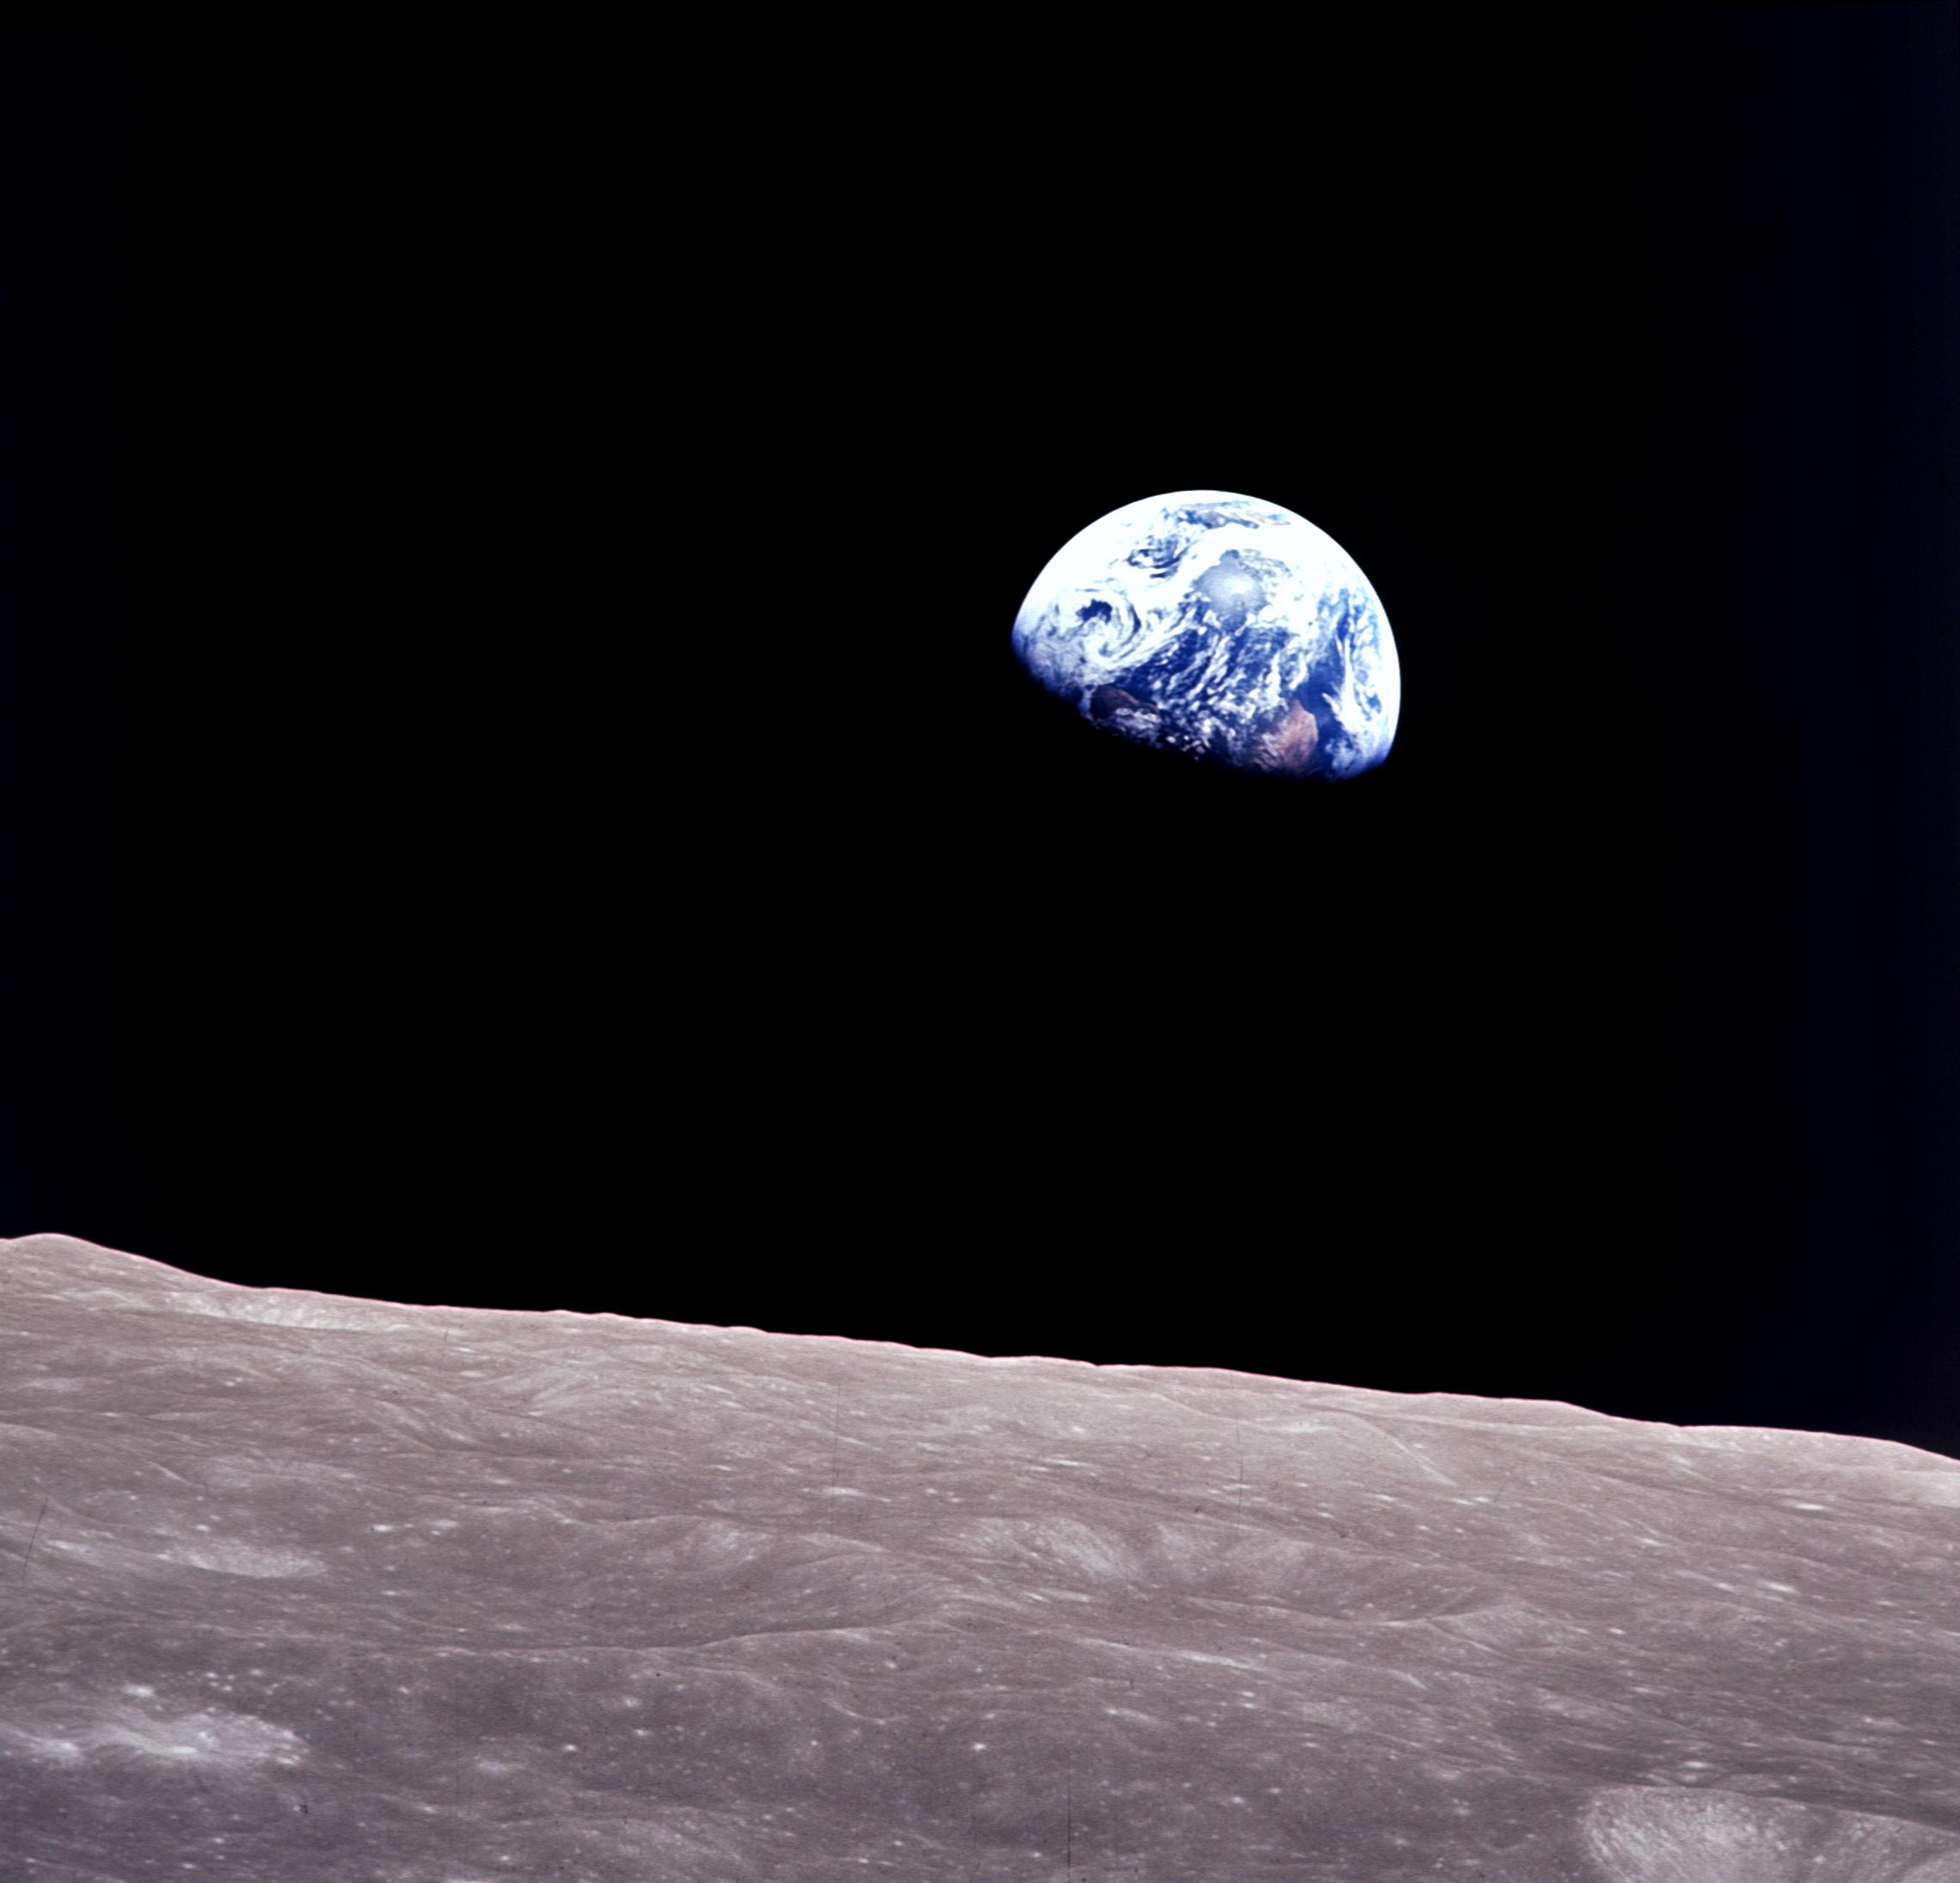 """Earthrise"" Photo courtesy of nasa.gov"